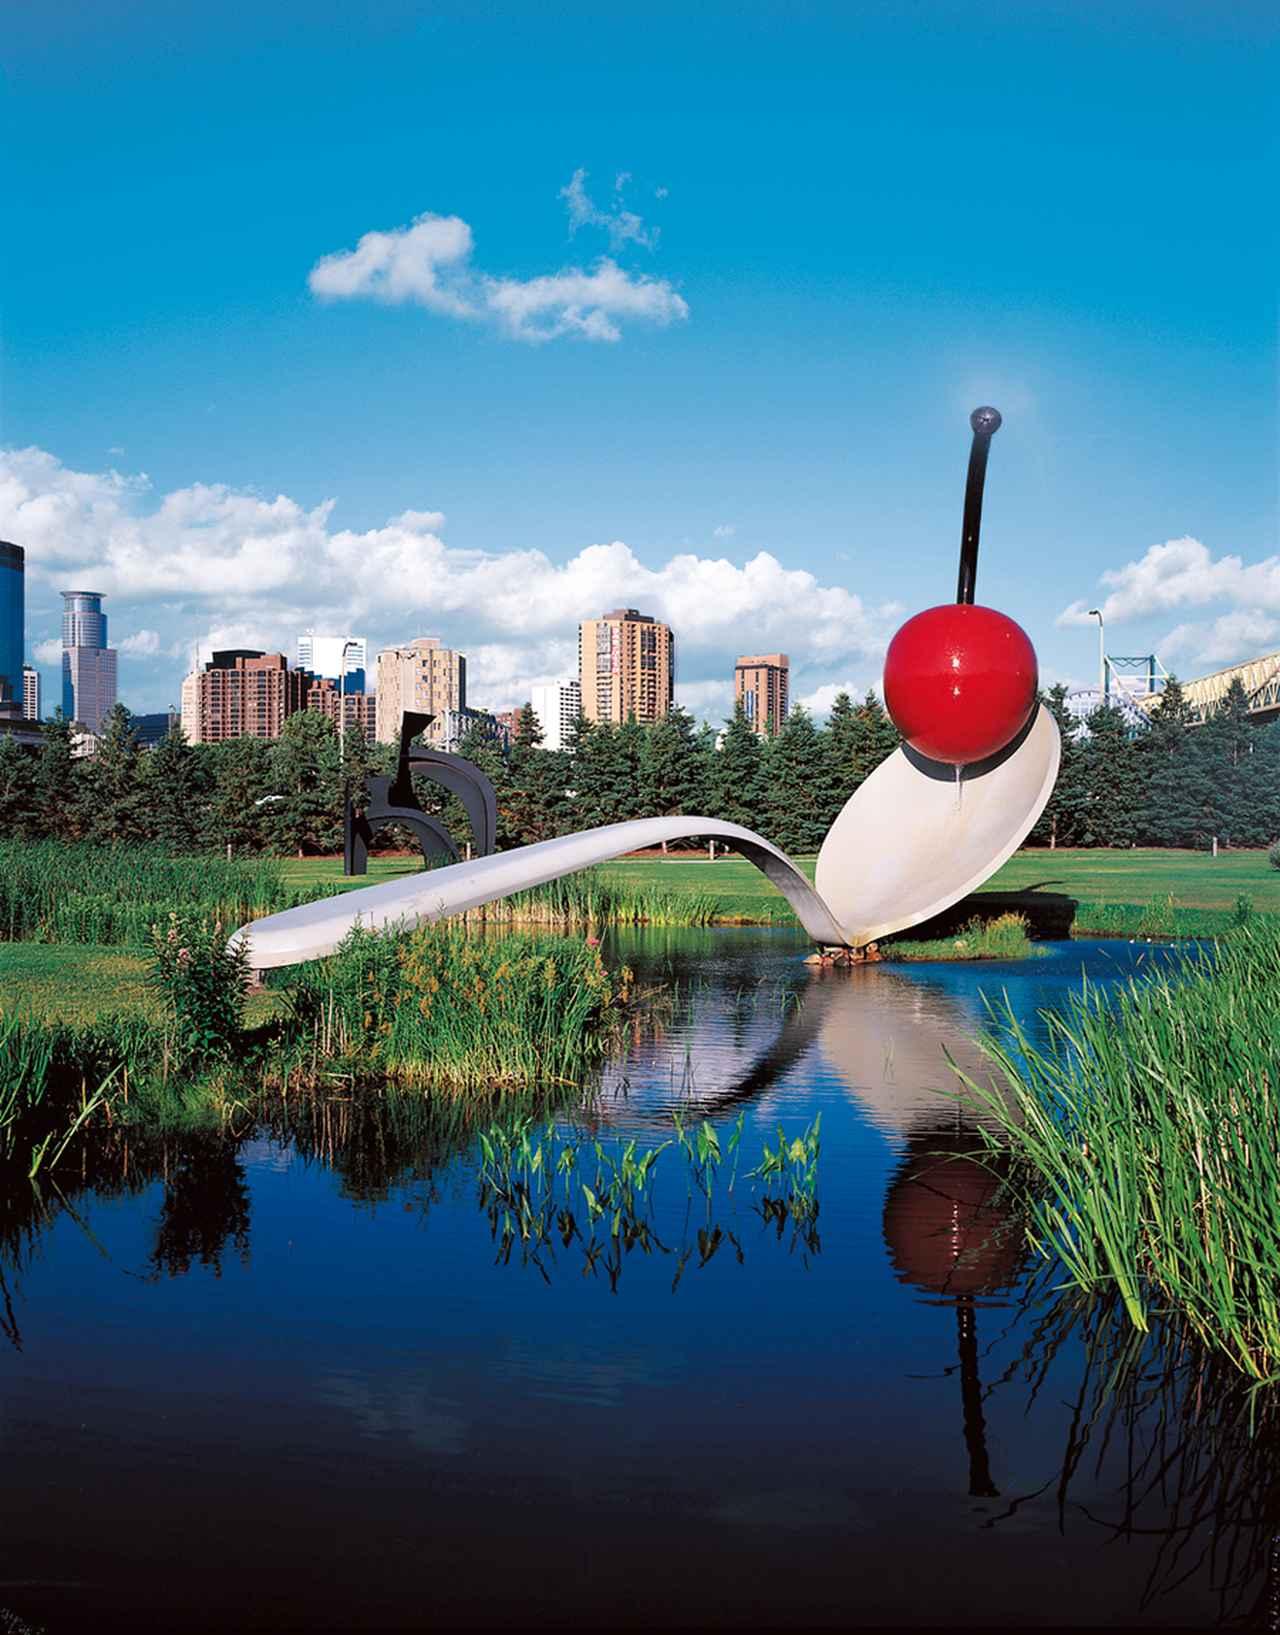 "Images : 12番目の画像 - 「ポップアートの""挑発者"" 彫刻家、クレス・オルデンバーグ<前編>」のアルバム - T JAPAN:The New York Times Style Magazine 公式サイト"